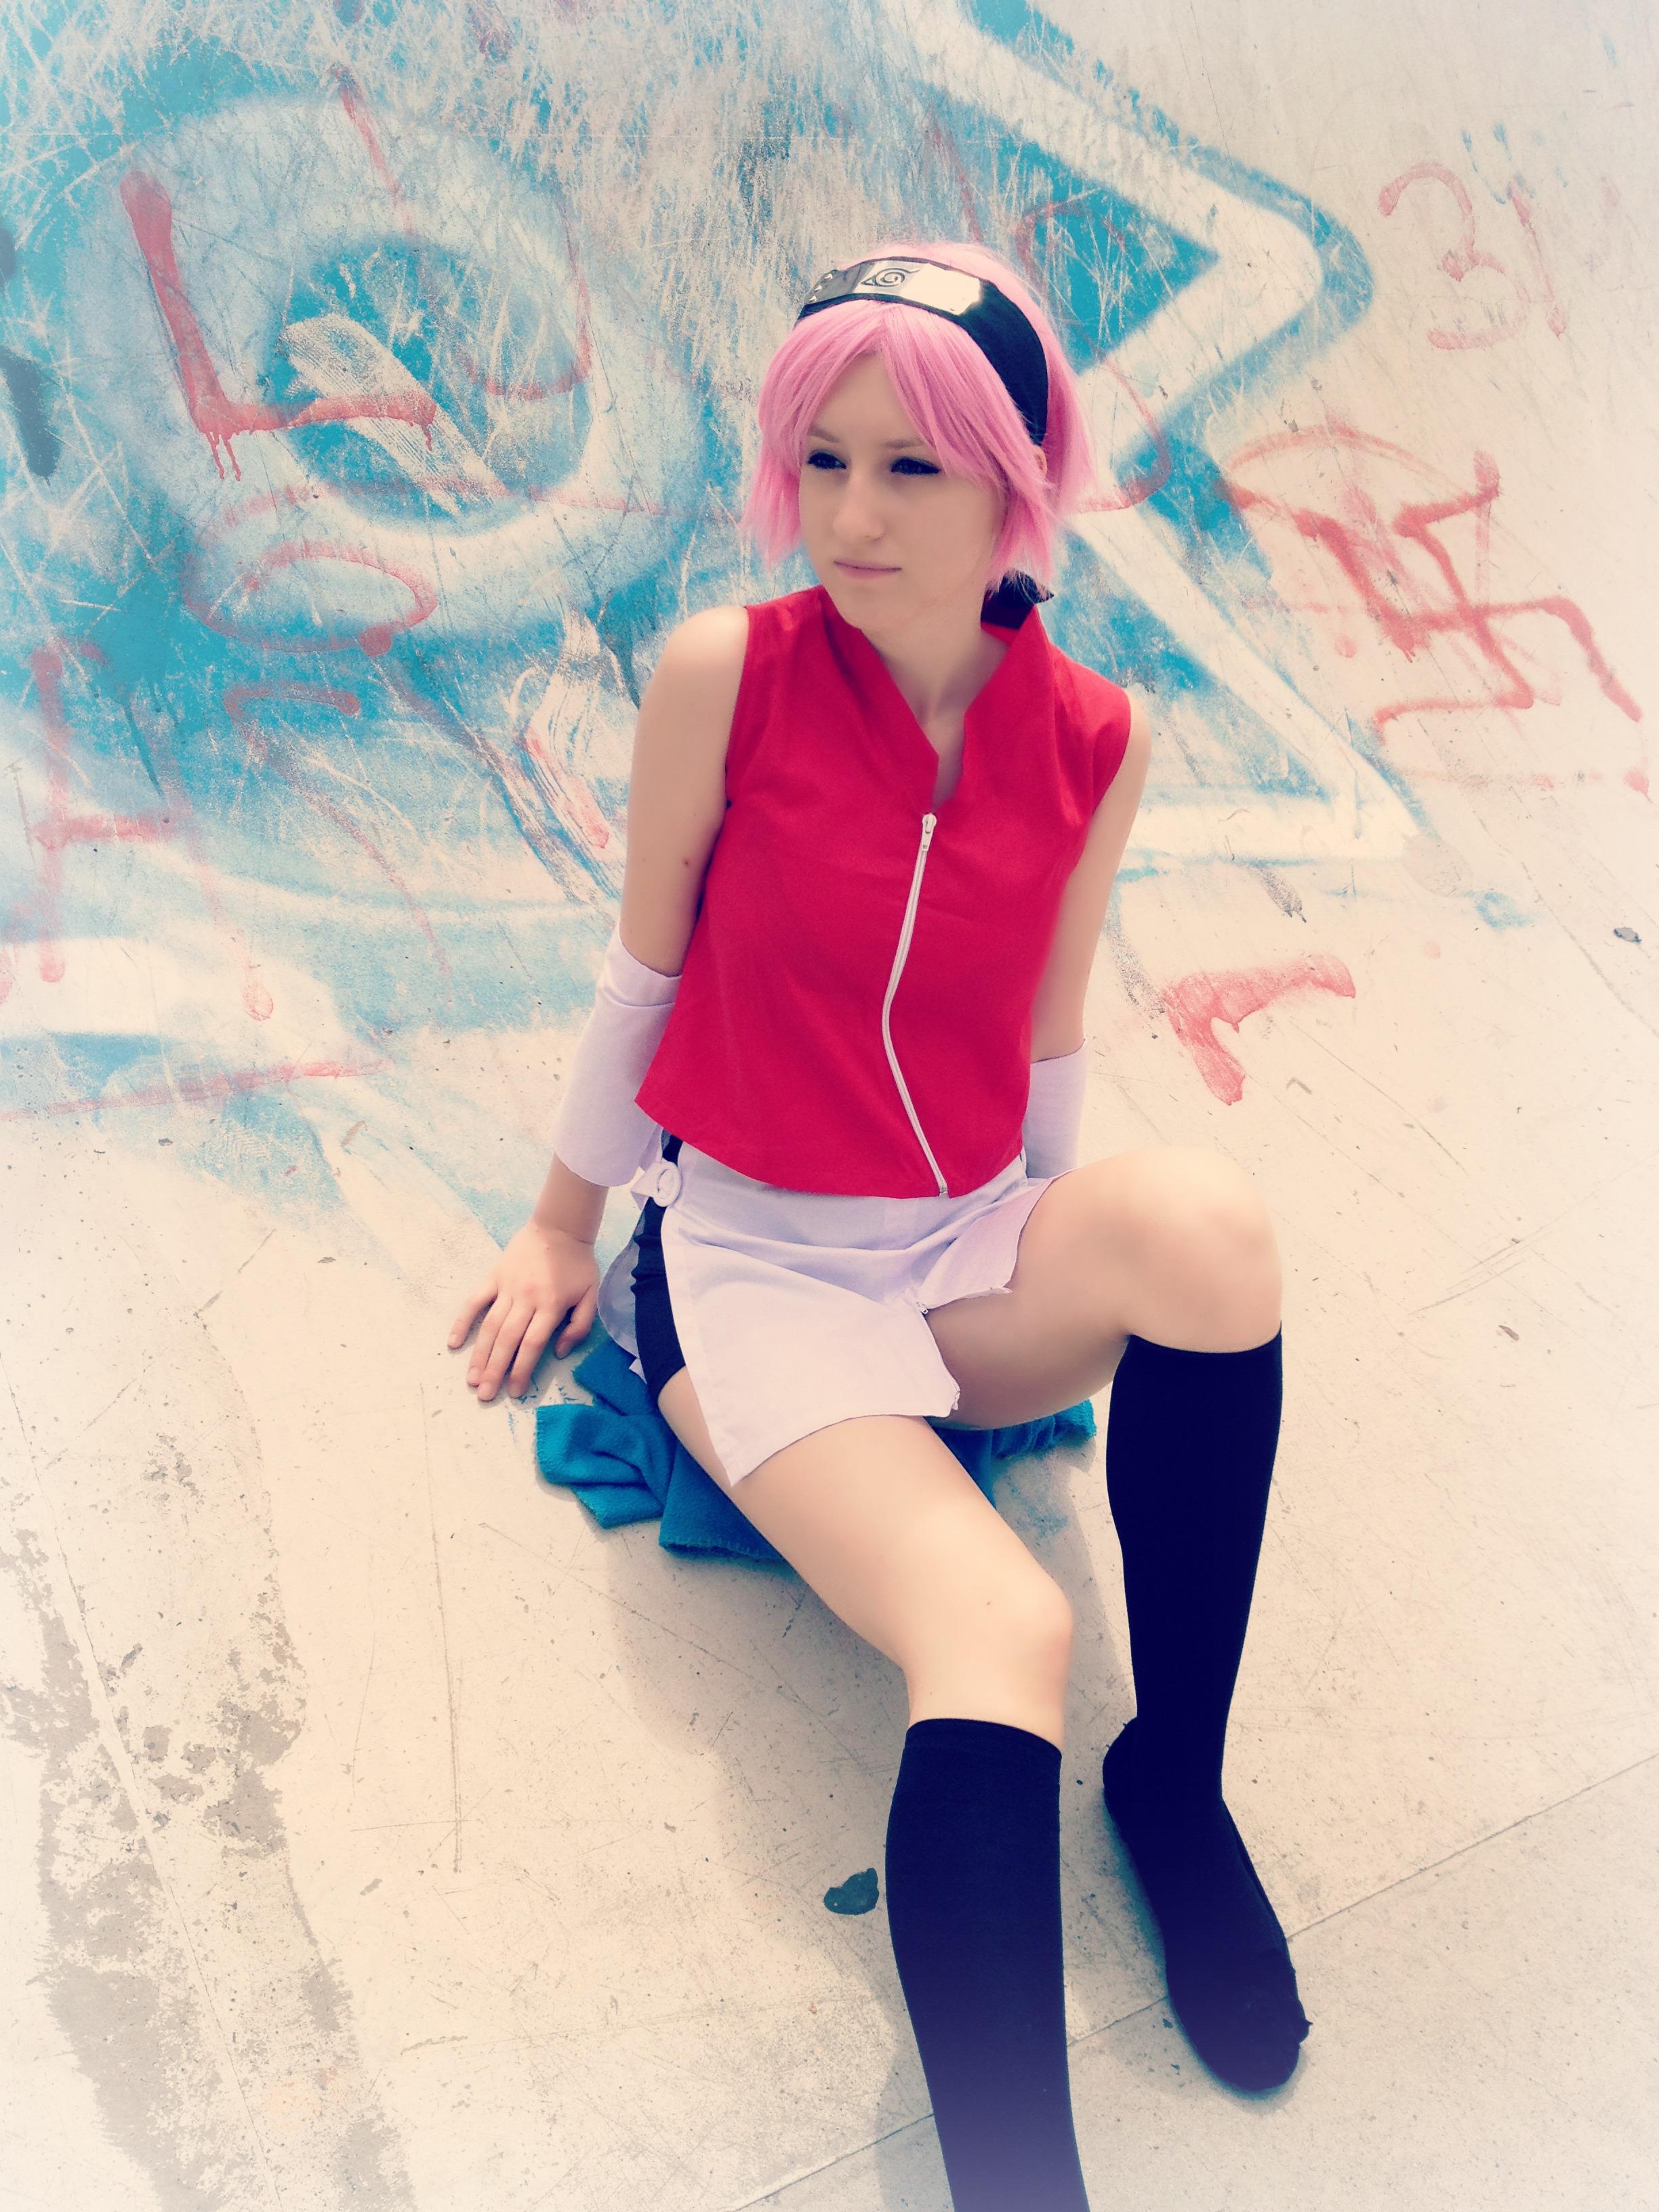 My Sakura Cosplay by Xx-KasumiChan-xX on DeviantArt